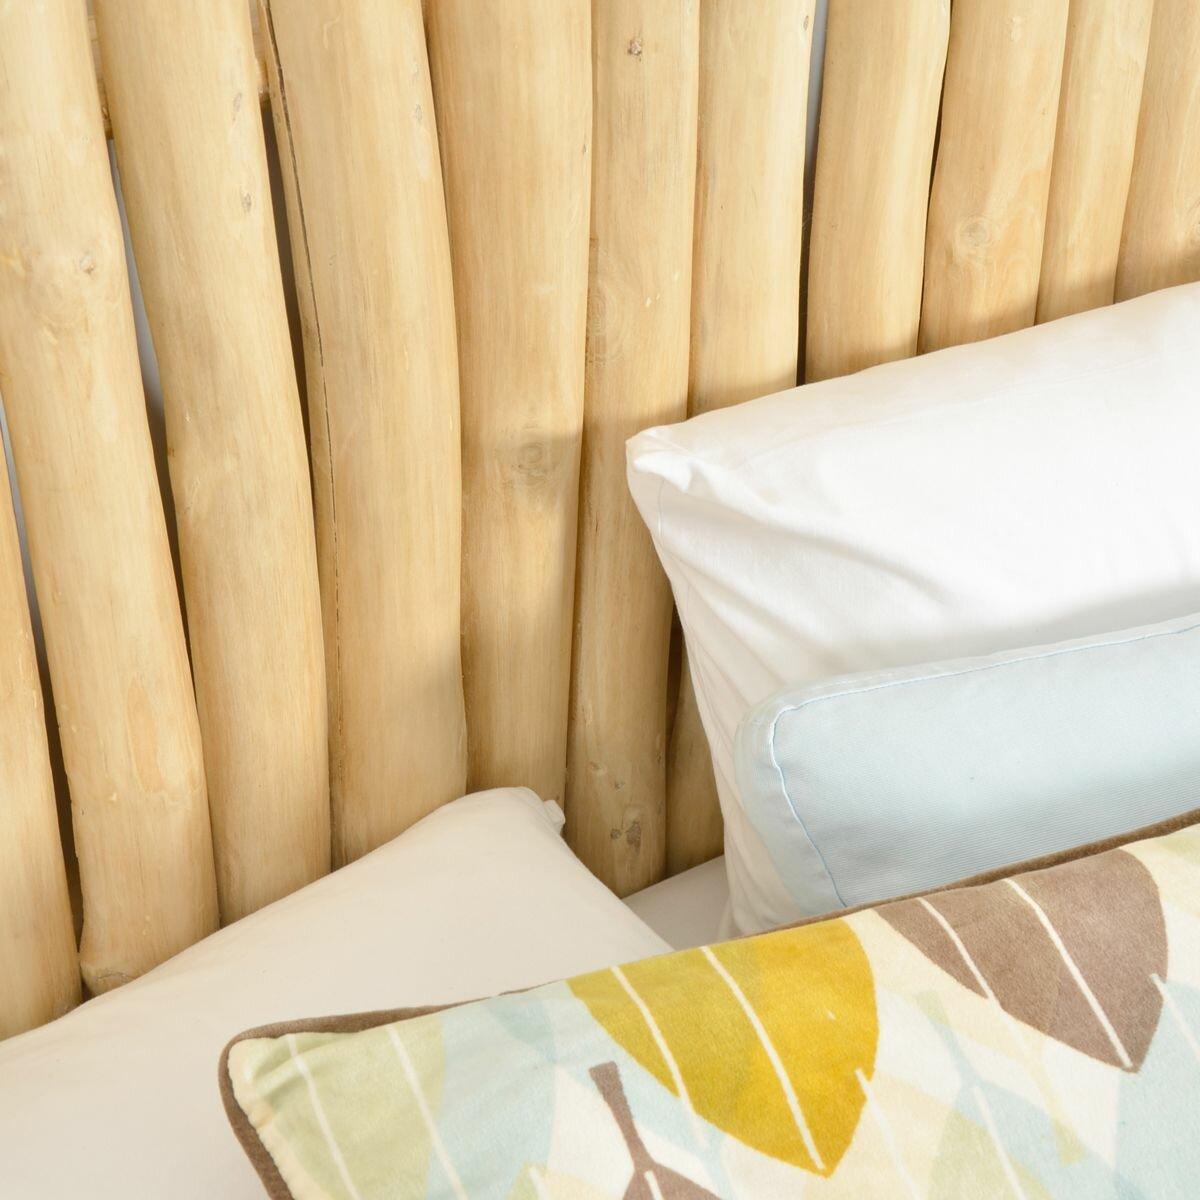 tikamoon bois flotte driftwood river panel double headboard reviews wayfair uk. Black Bedroom Furniture Sets. Home Design Ideas